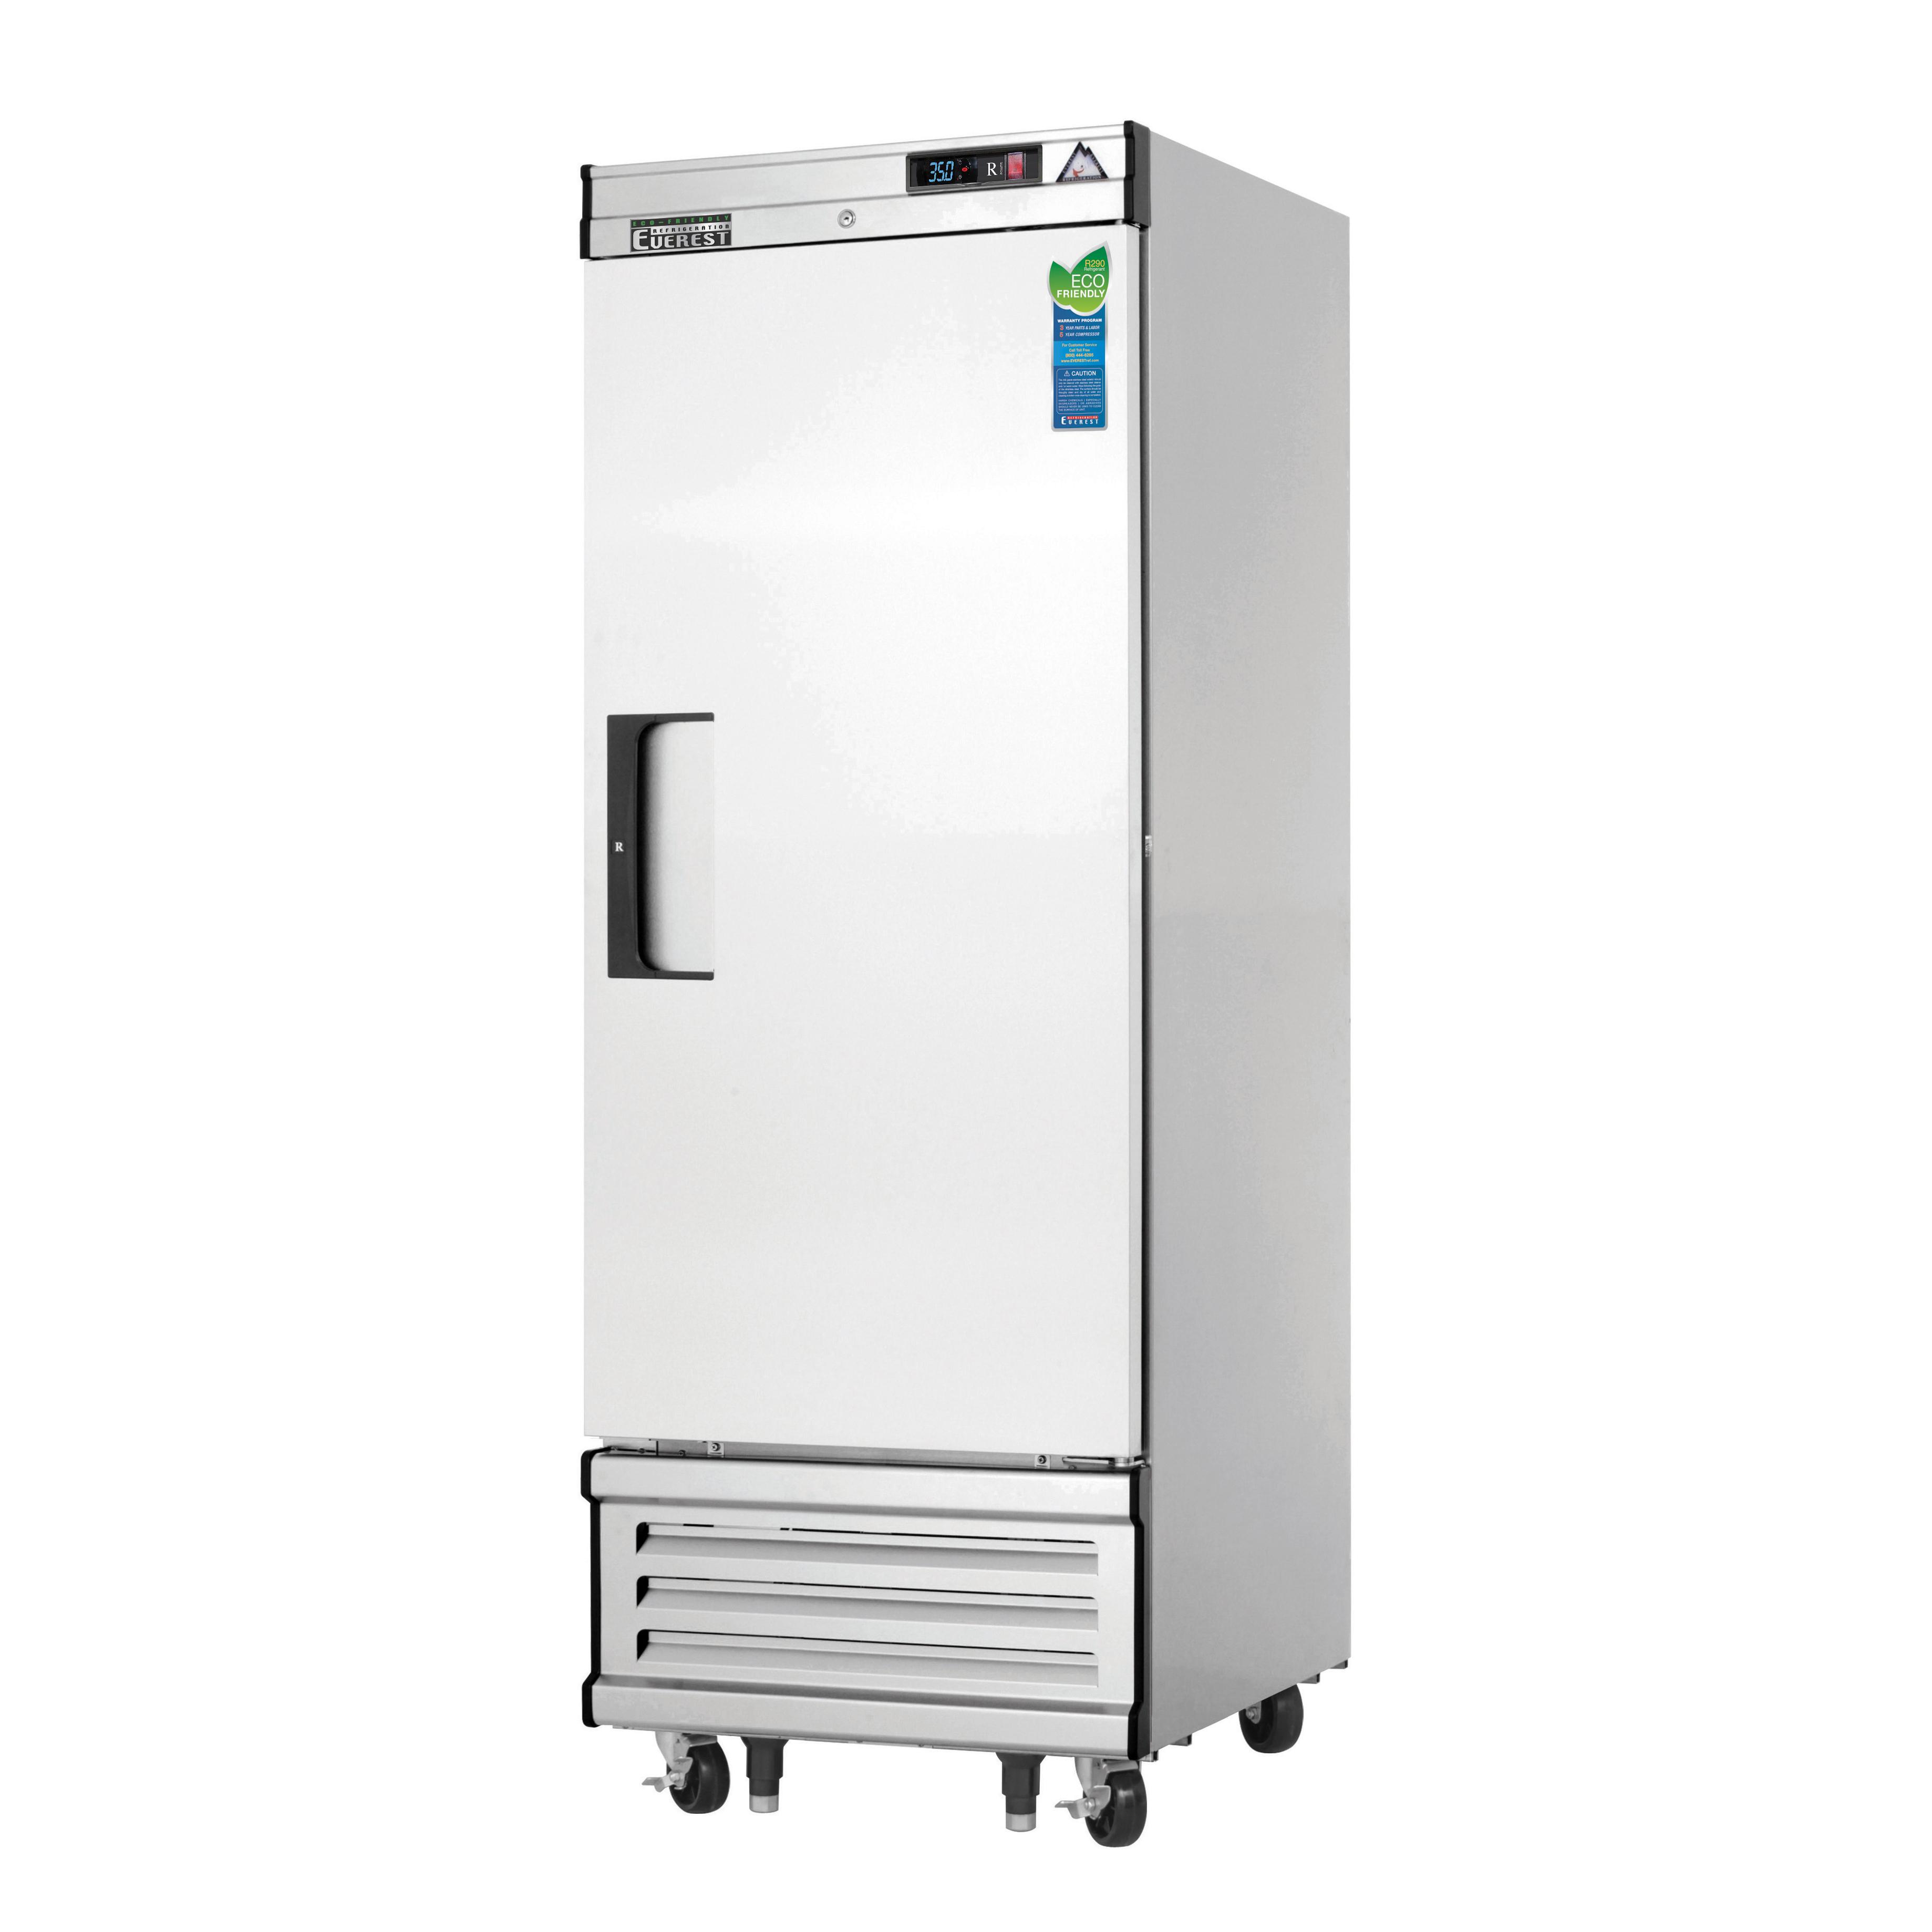 EBWR1 Everest Refrigeration refrigerator, reach-in